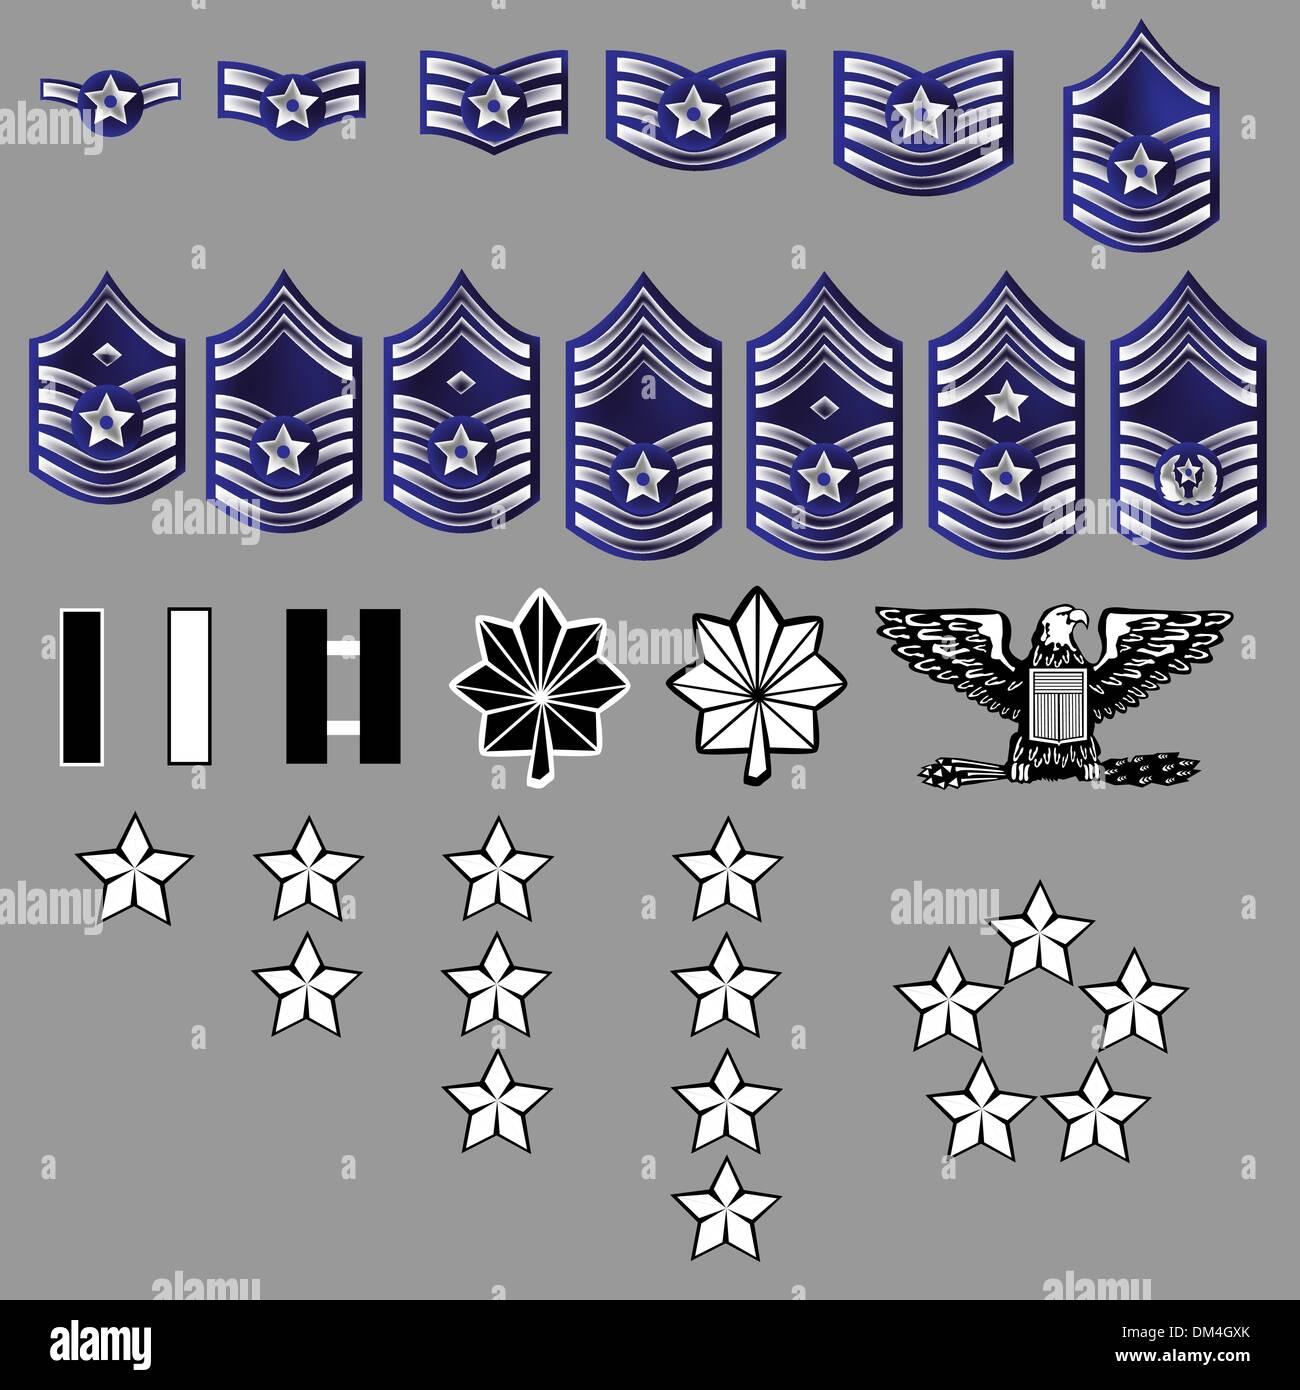 US Luftwaffe Rank Insignia Textur Vektor Abbildung Bild